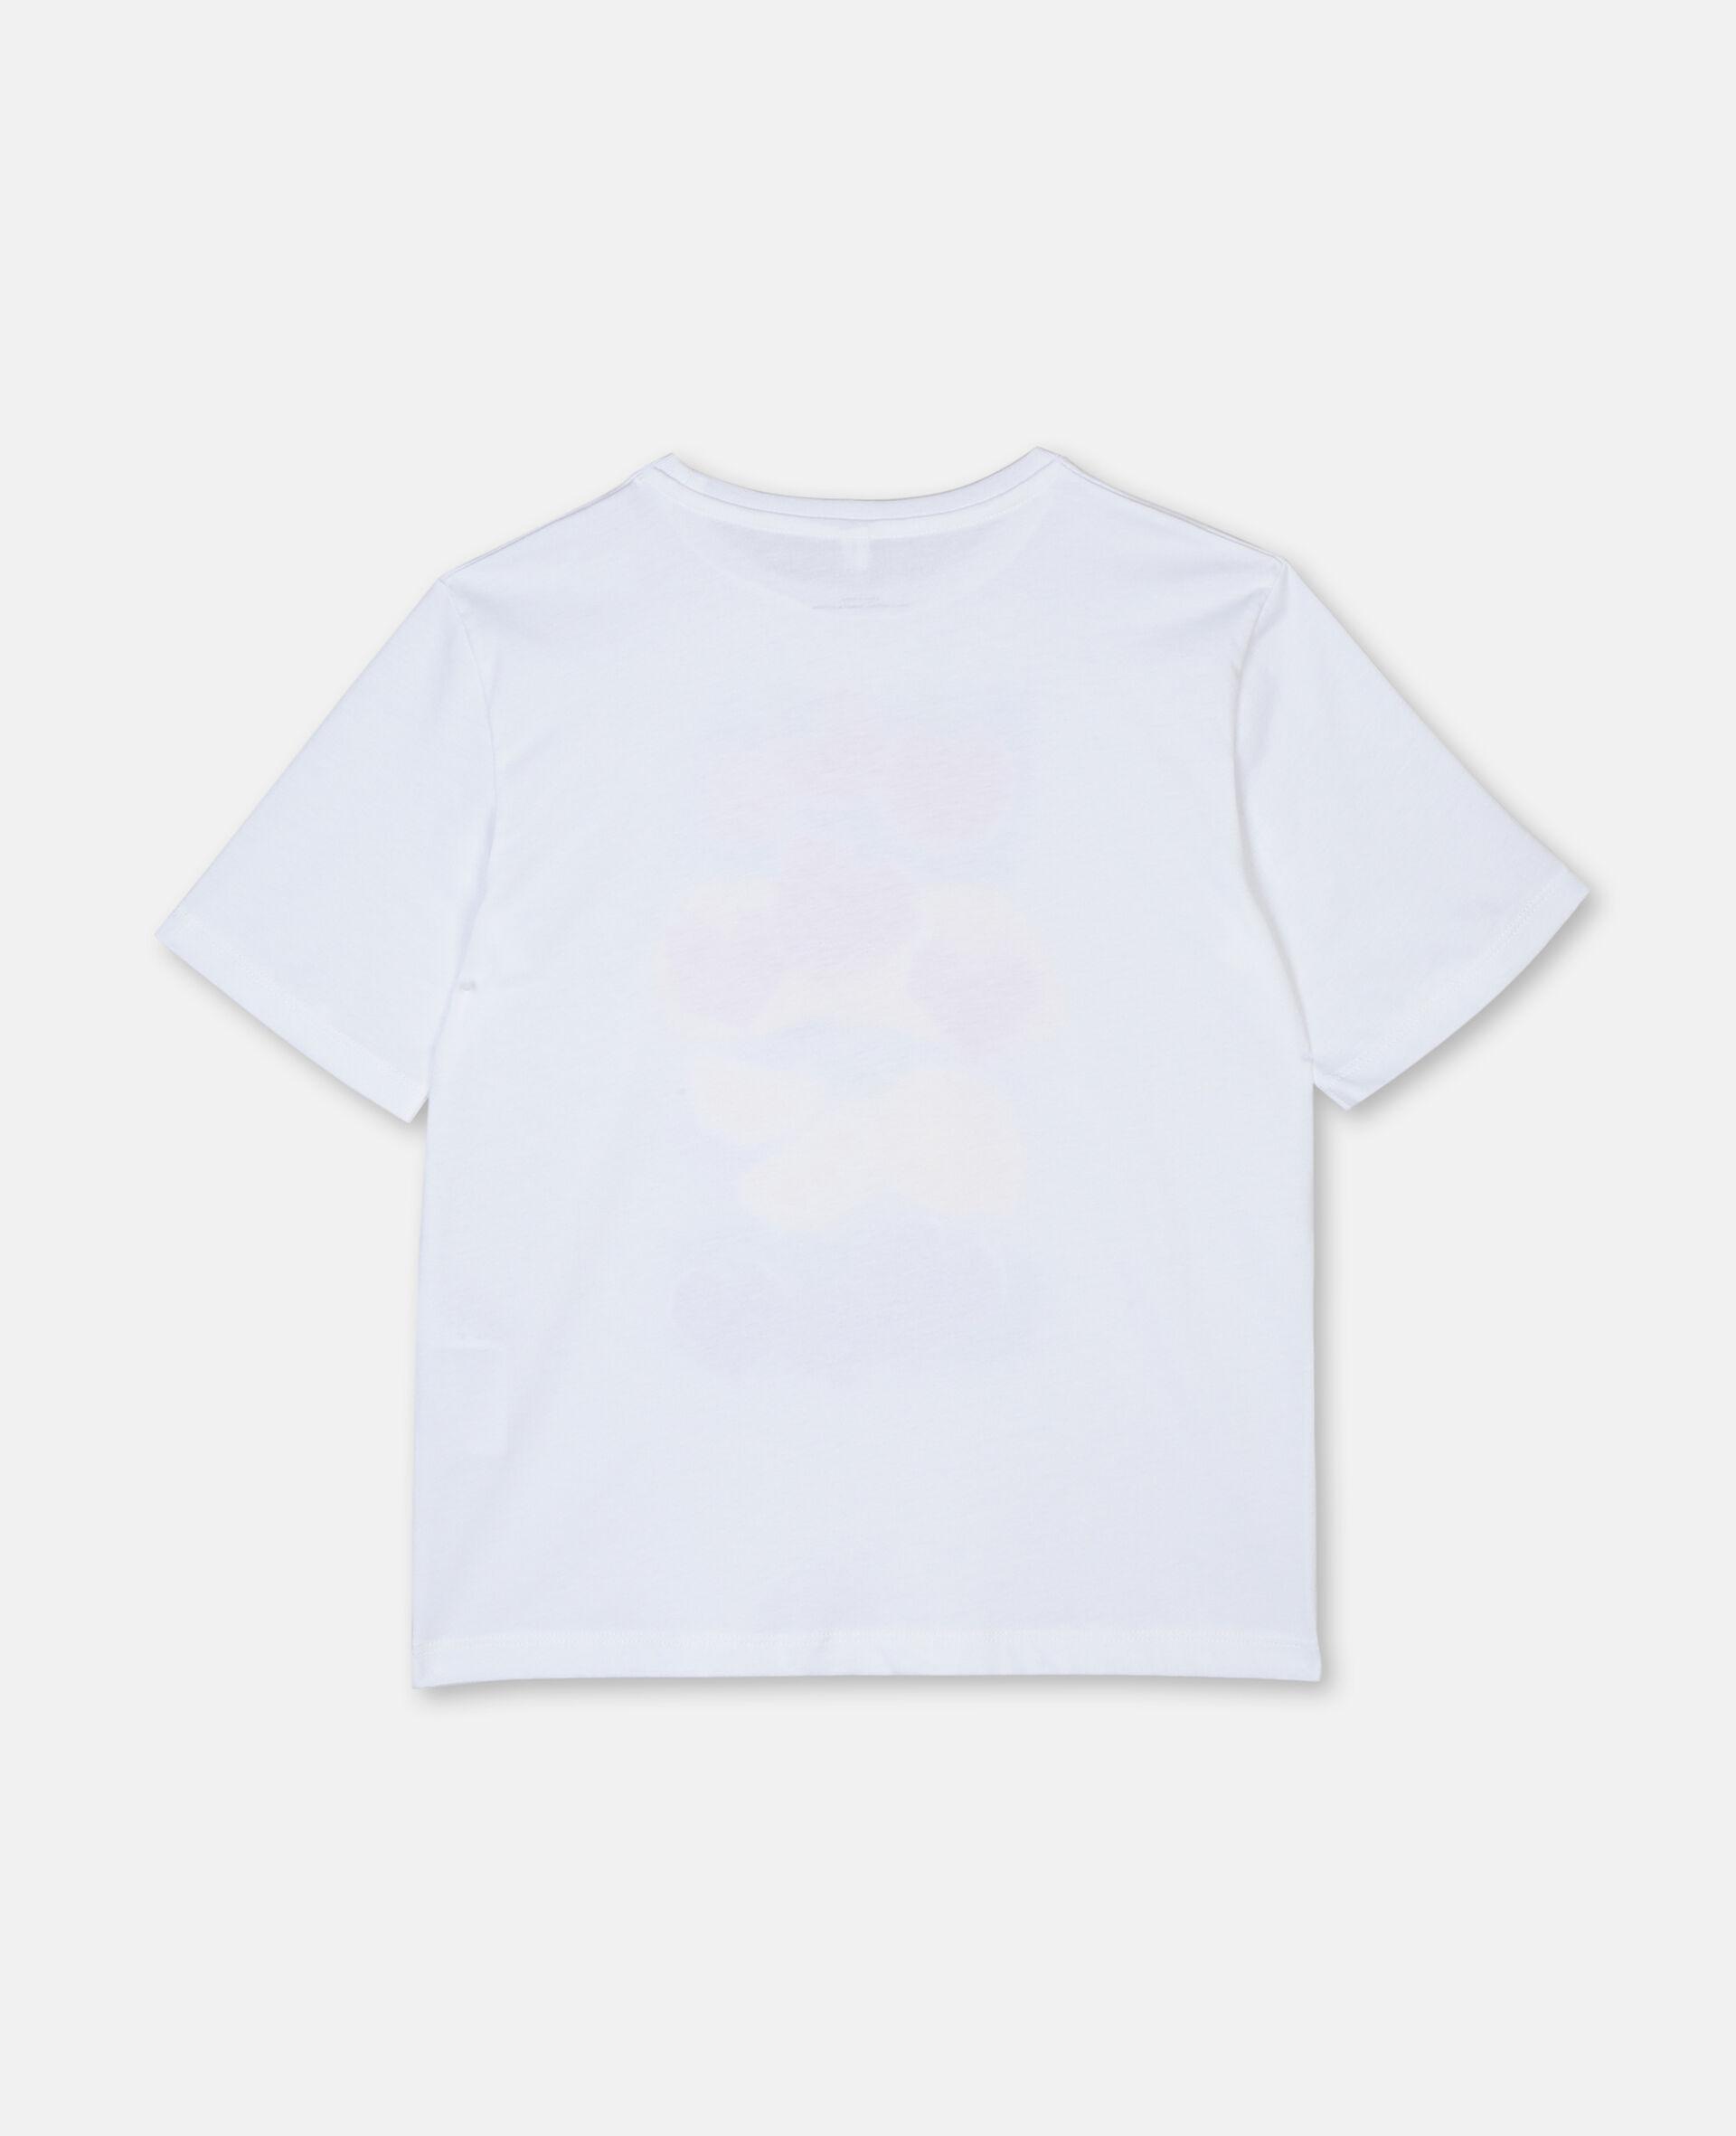 Oversized-T-Shirt aus Baumwolle mit Früchte-Print-Rose-large image number 2